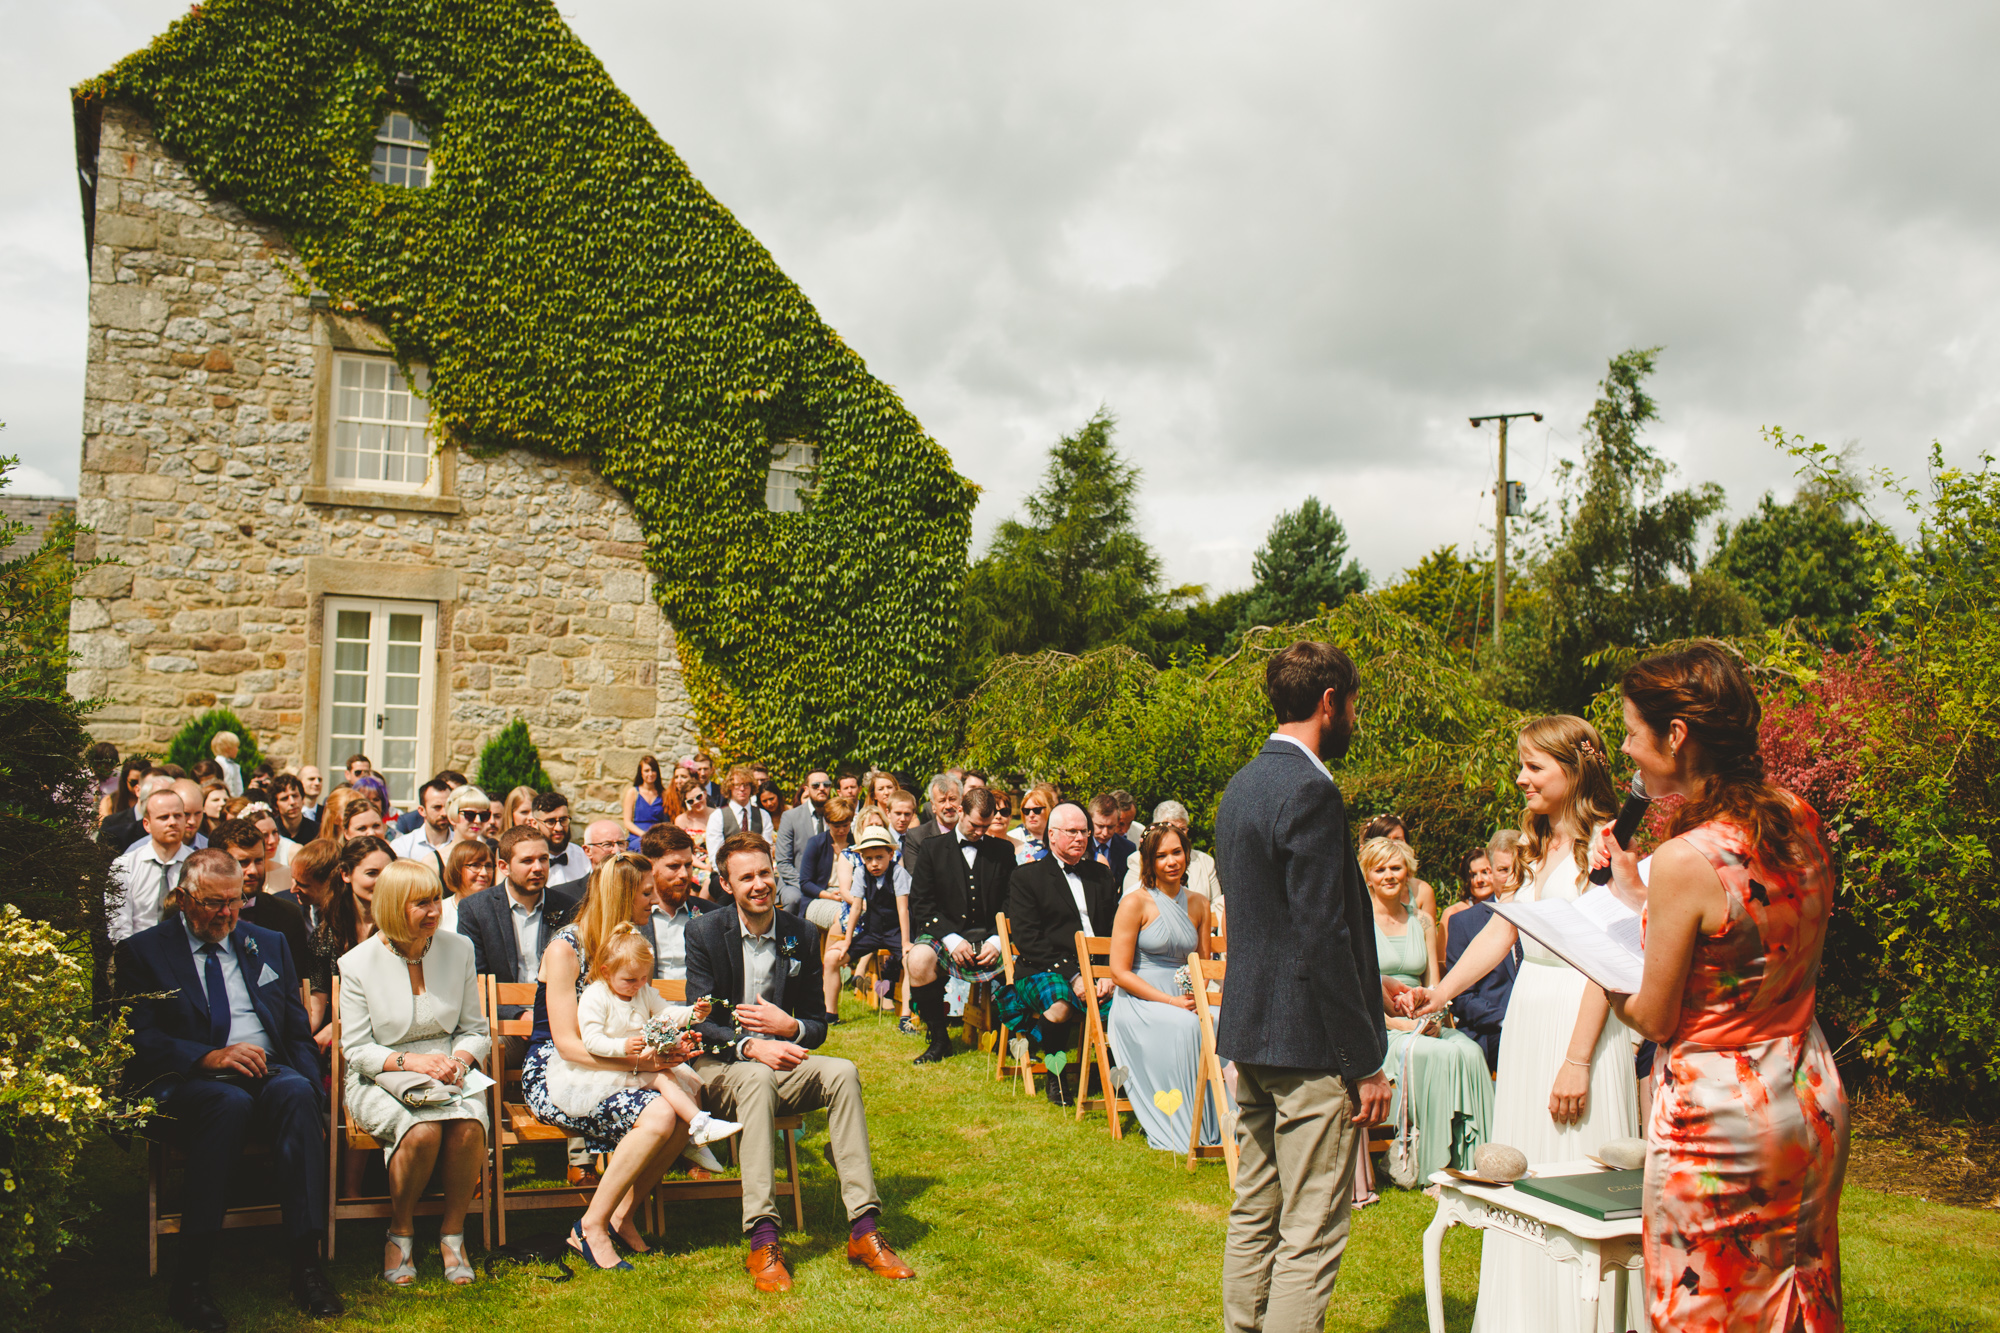 derbyshire-wedding-photographer-filmmaker-carsington-water--4.jpg